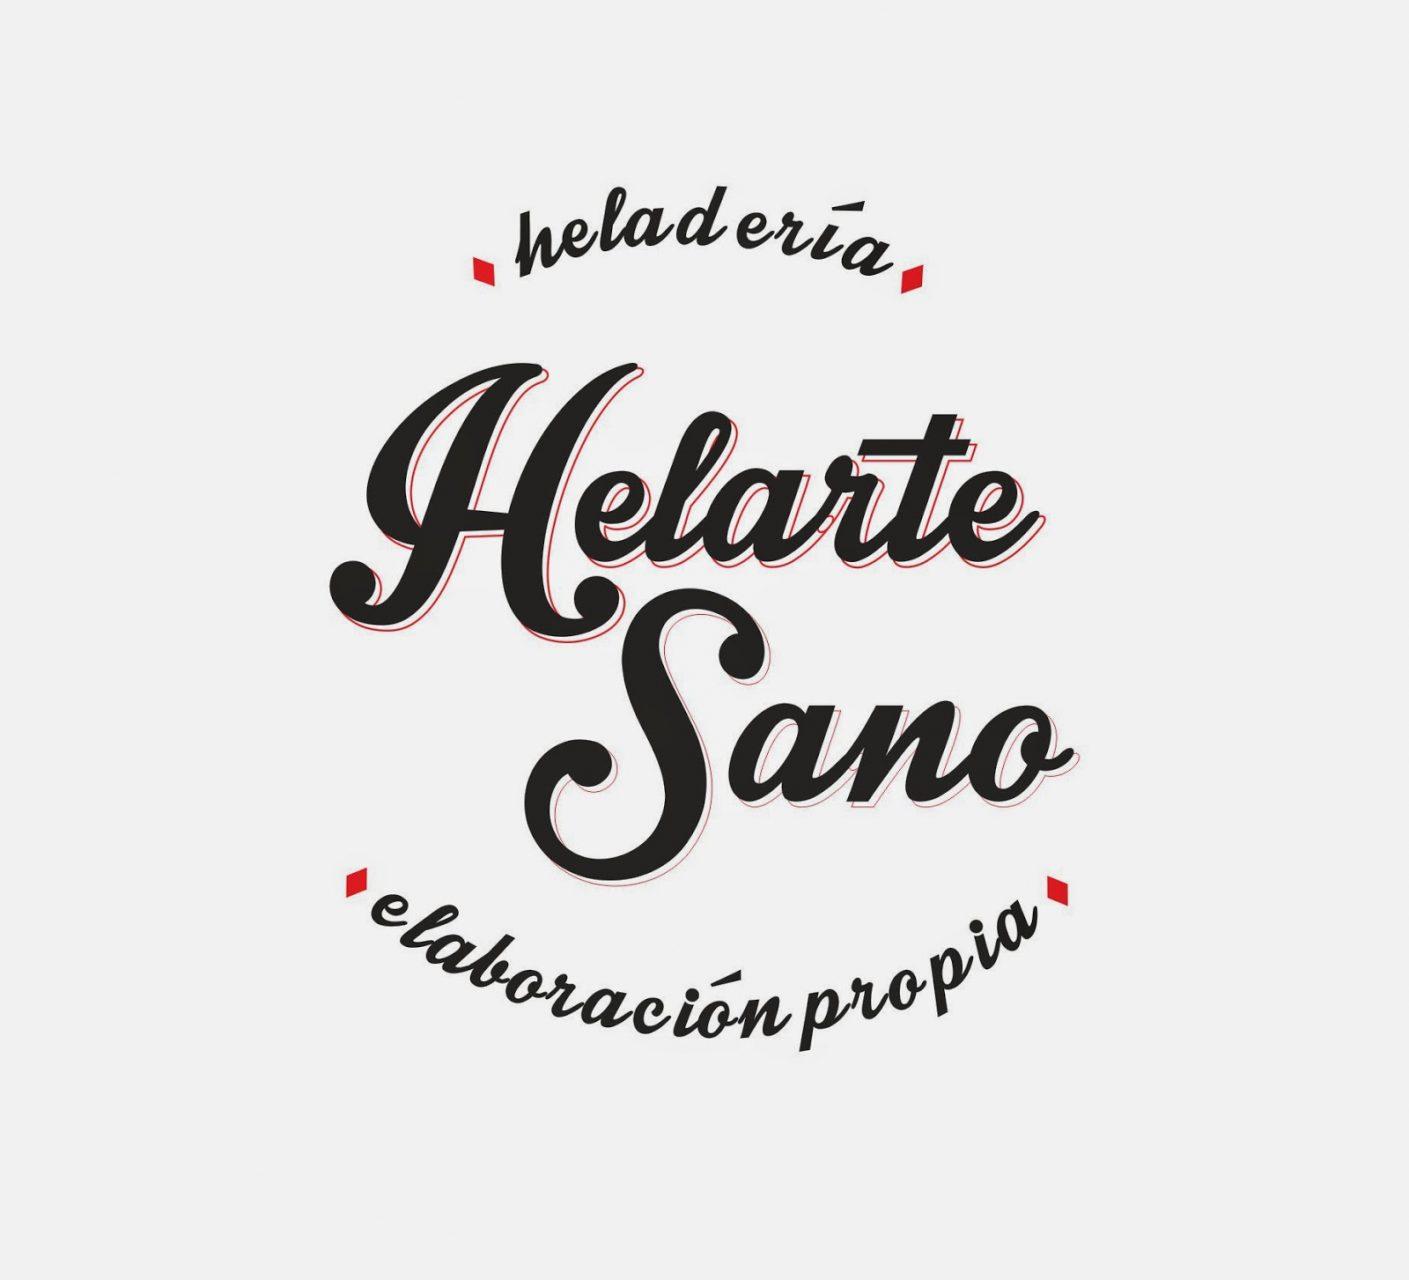 logotipo helarte sano brading logo imagen corporativa rojo blanco heladeria ice cream red white